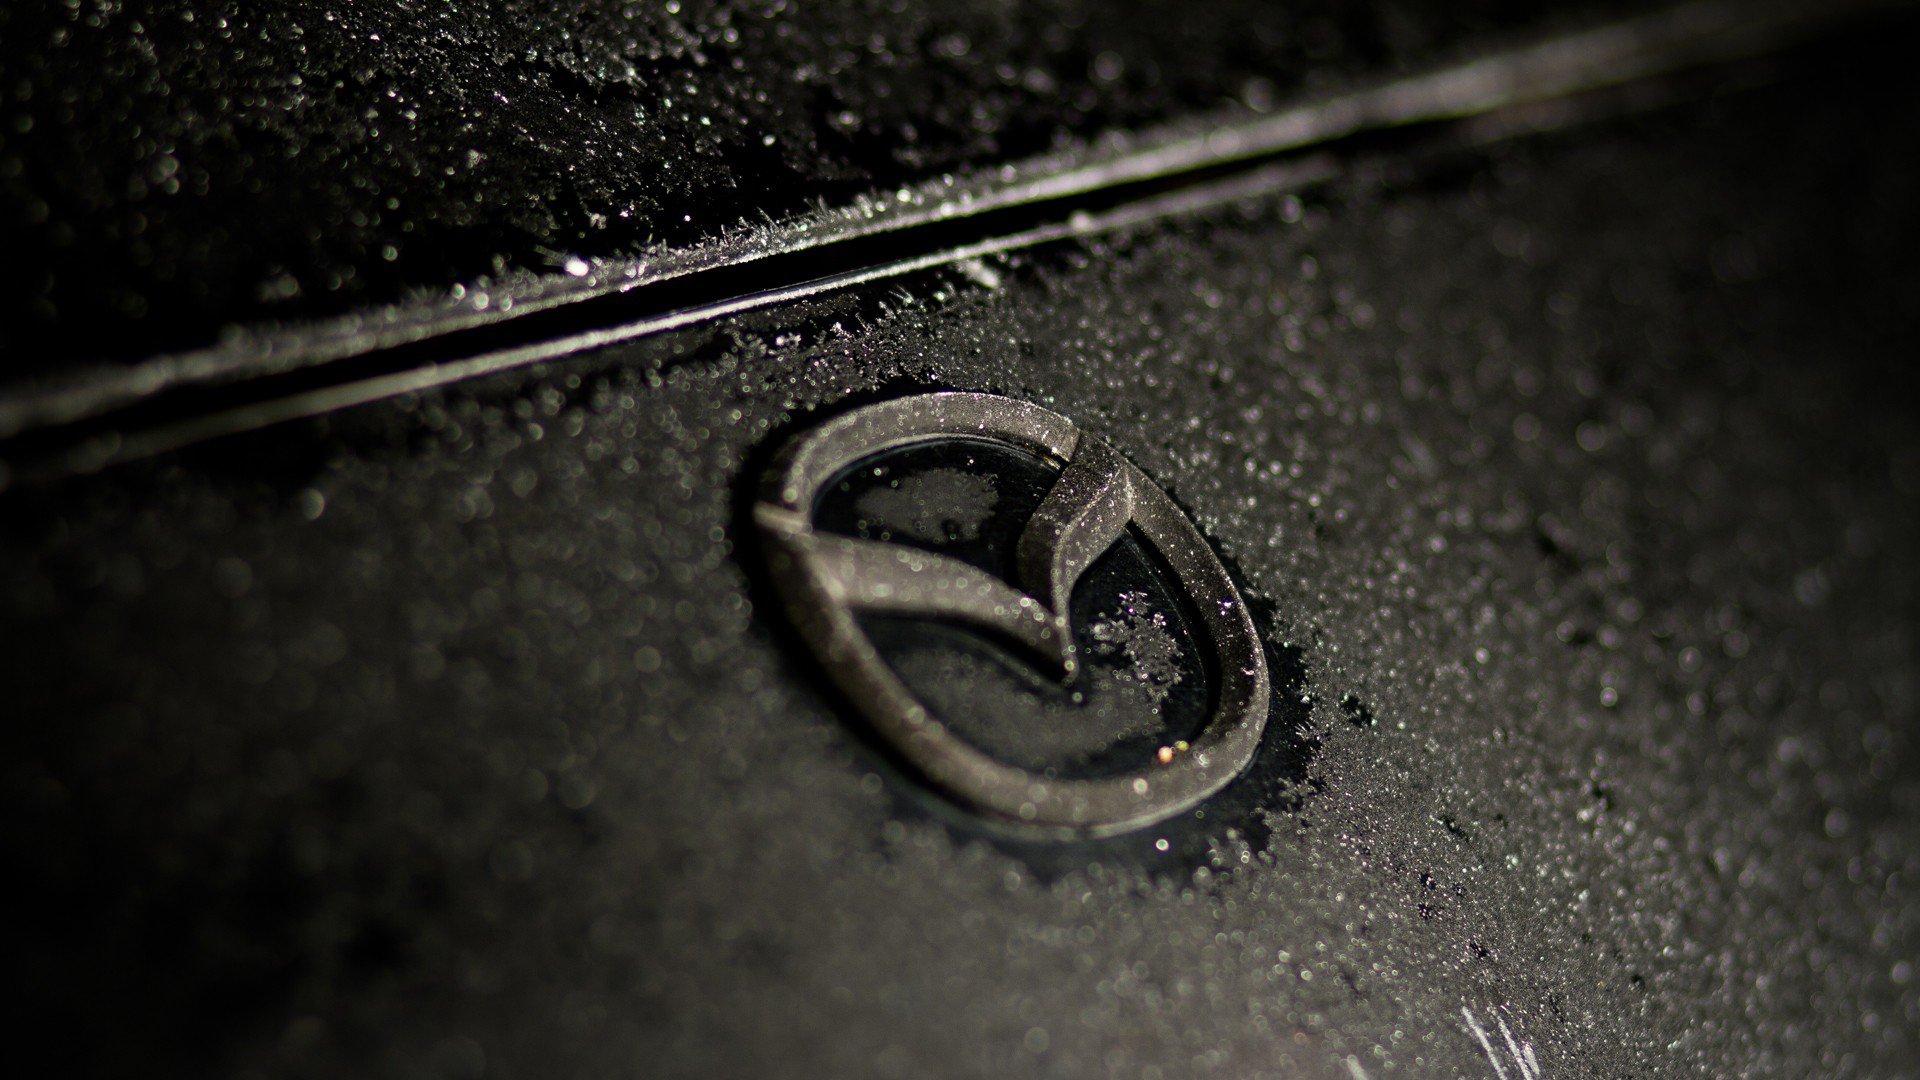 Mazda Rx7 Iphone Wallpaper Mazda Full Hd Wallpaper And Background 1920x1080 Id 224008